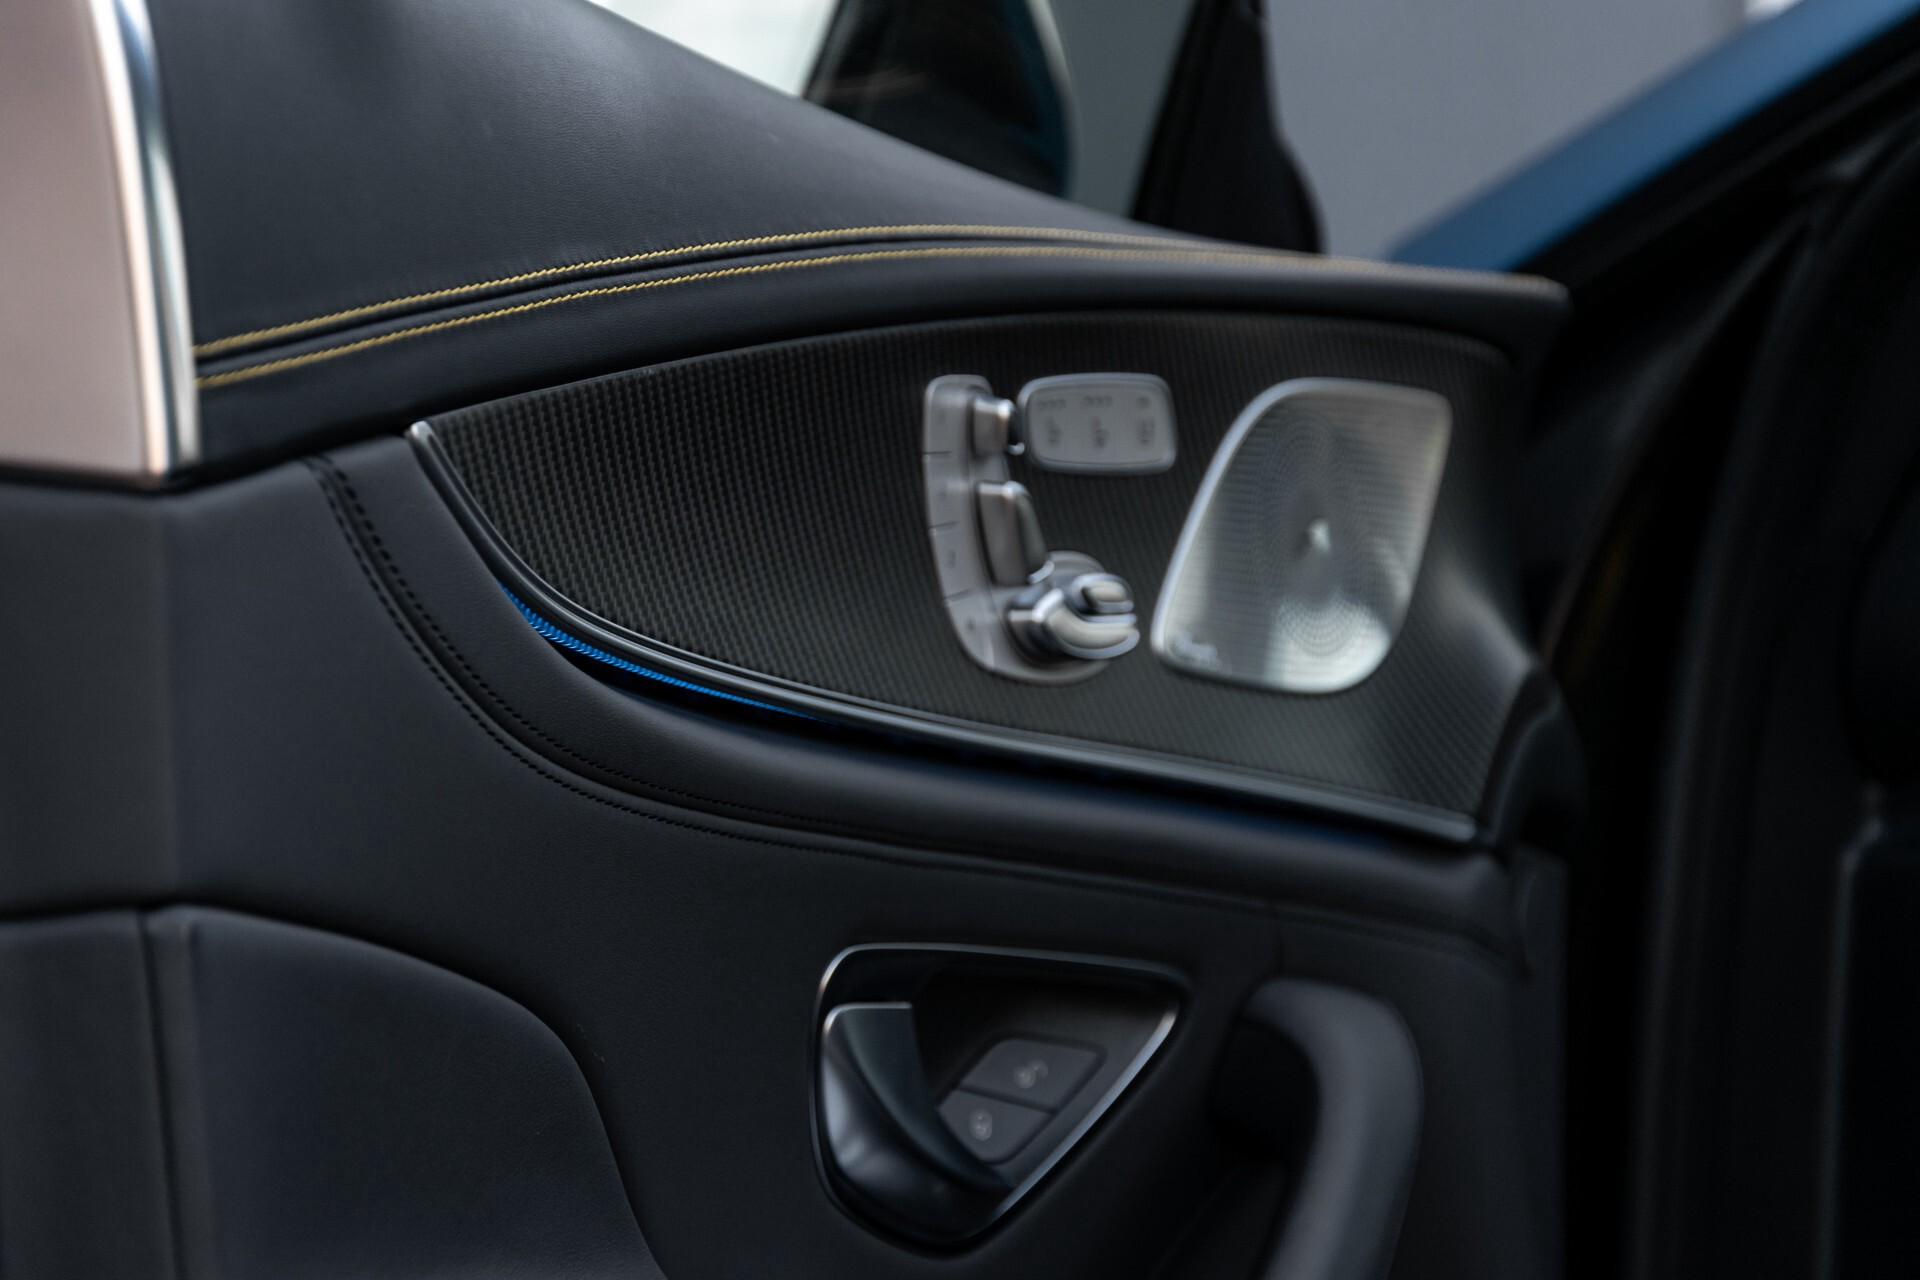 Mercedes-Benz AMG GT 4-Door Coupe 63 S 4MATIC+ Edition 1 Keramisch/Carbon/First Class/Dynamic Plus/Burmester High End 3D Aut9 Foto 30